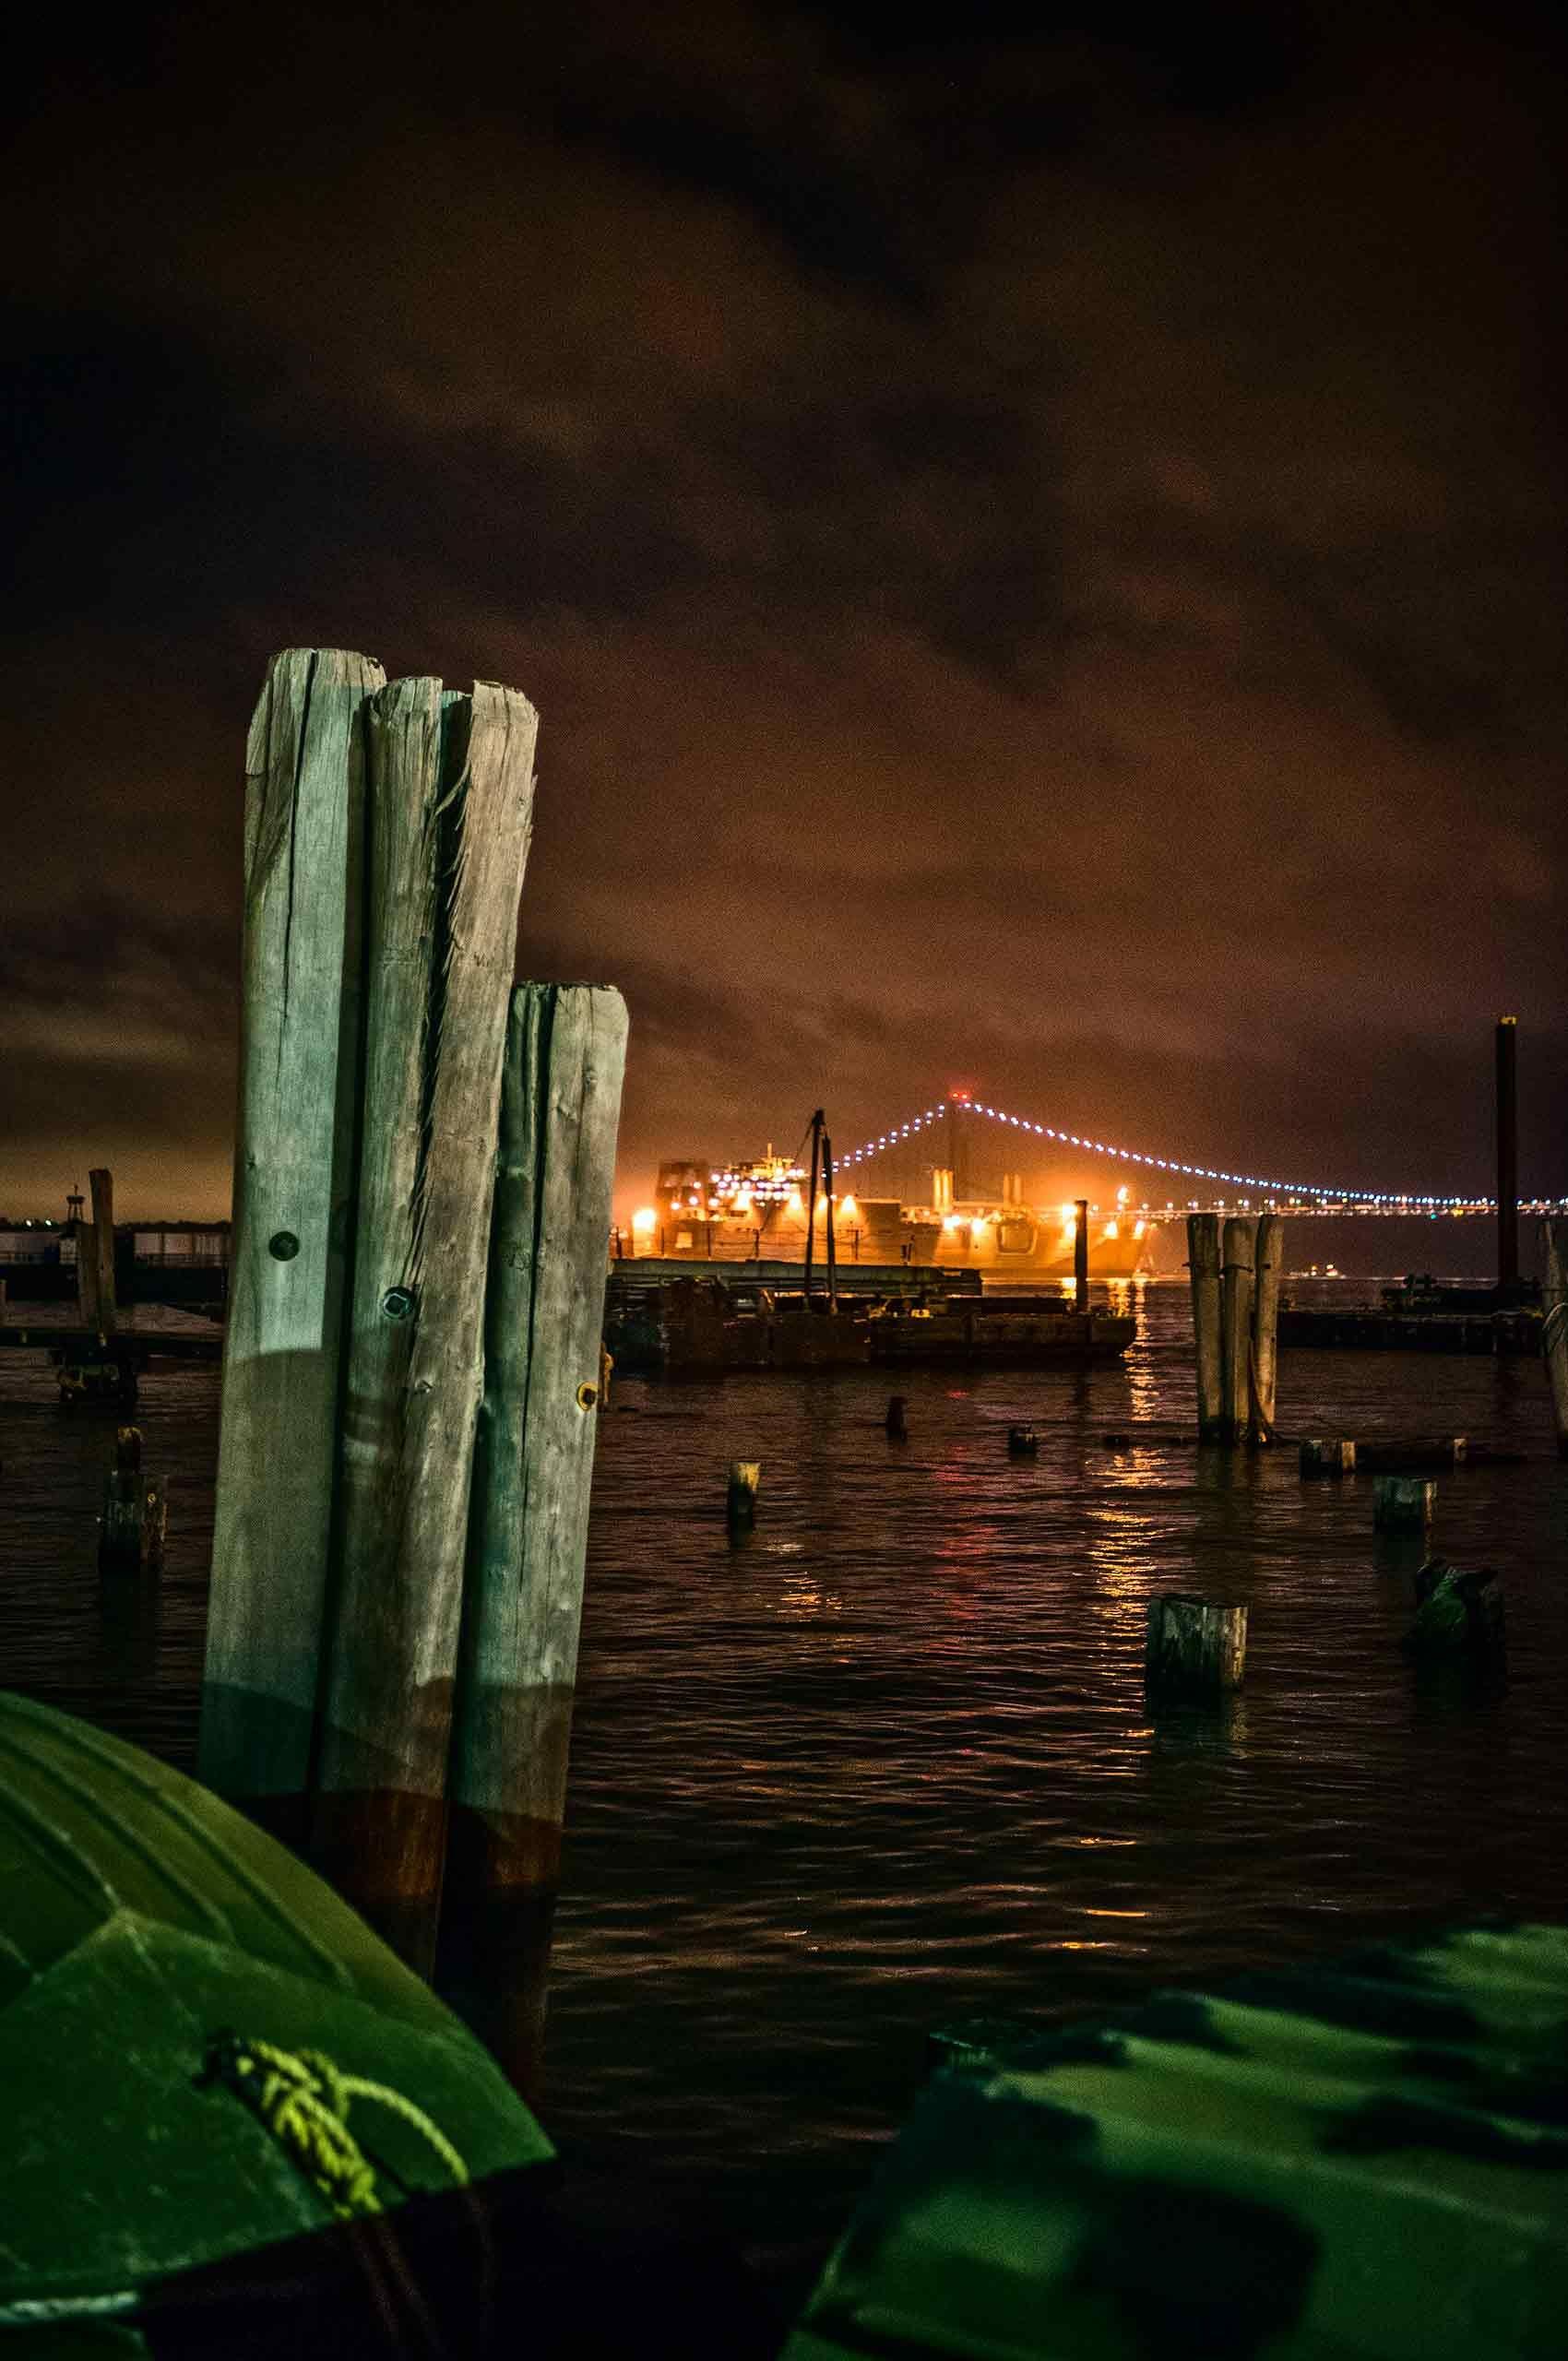 Harbor-Night-StatenIsland-by-HenrikOlundPhotography.jpg